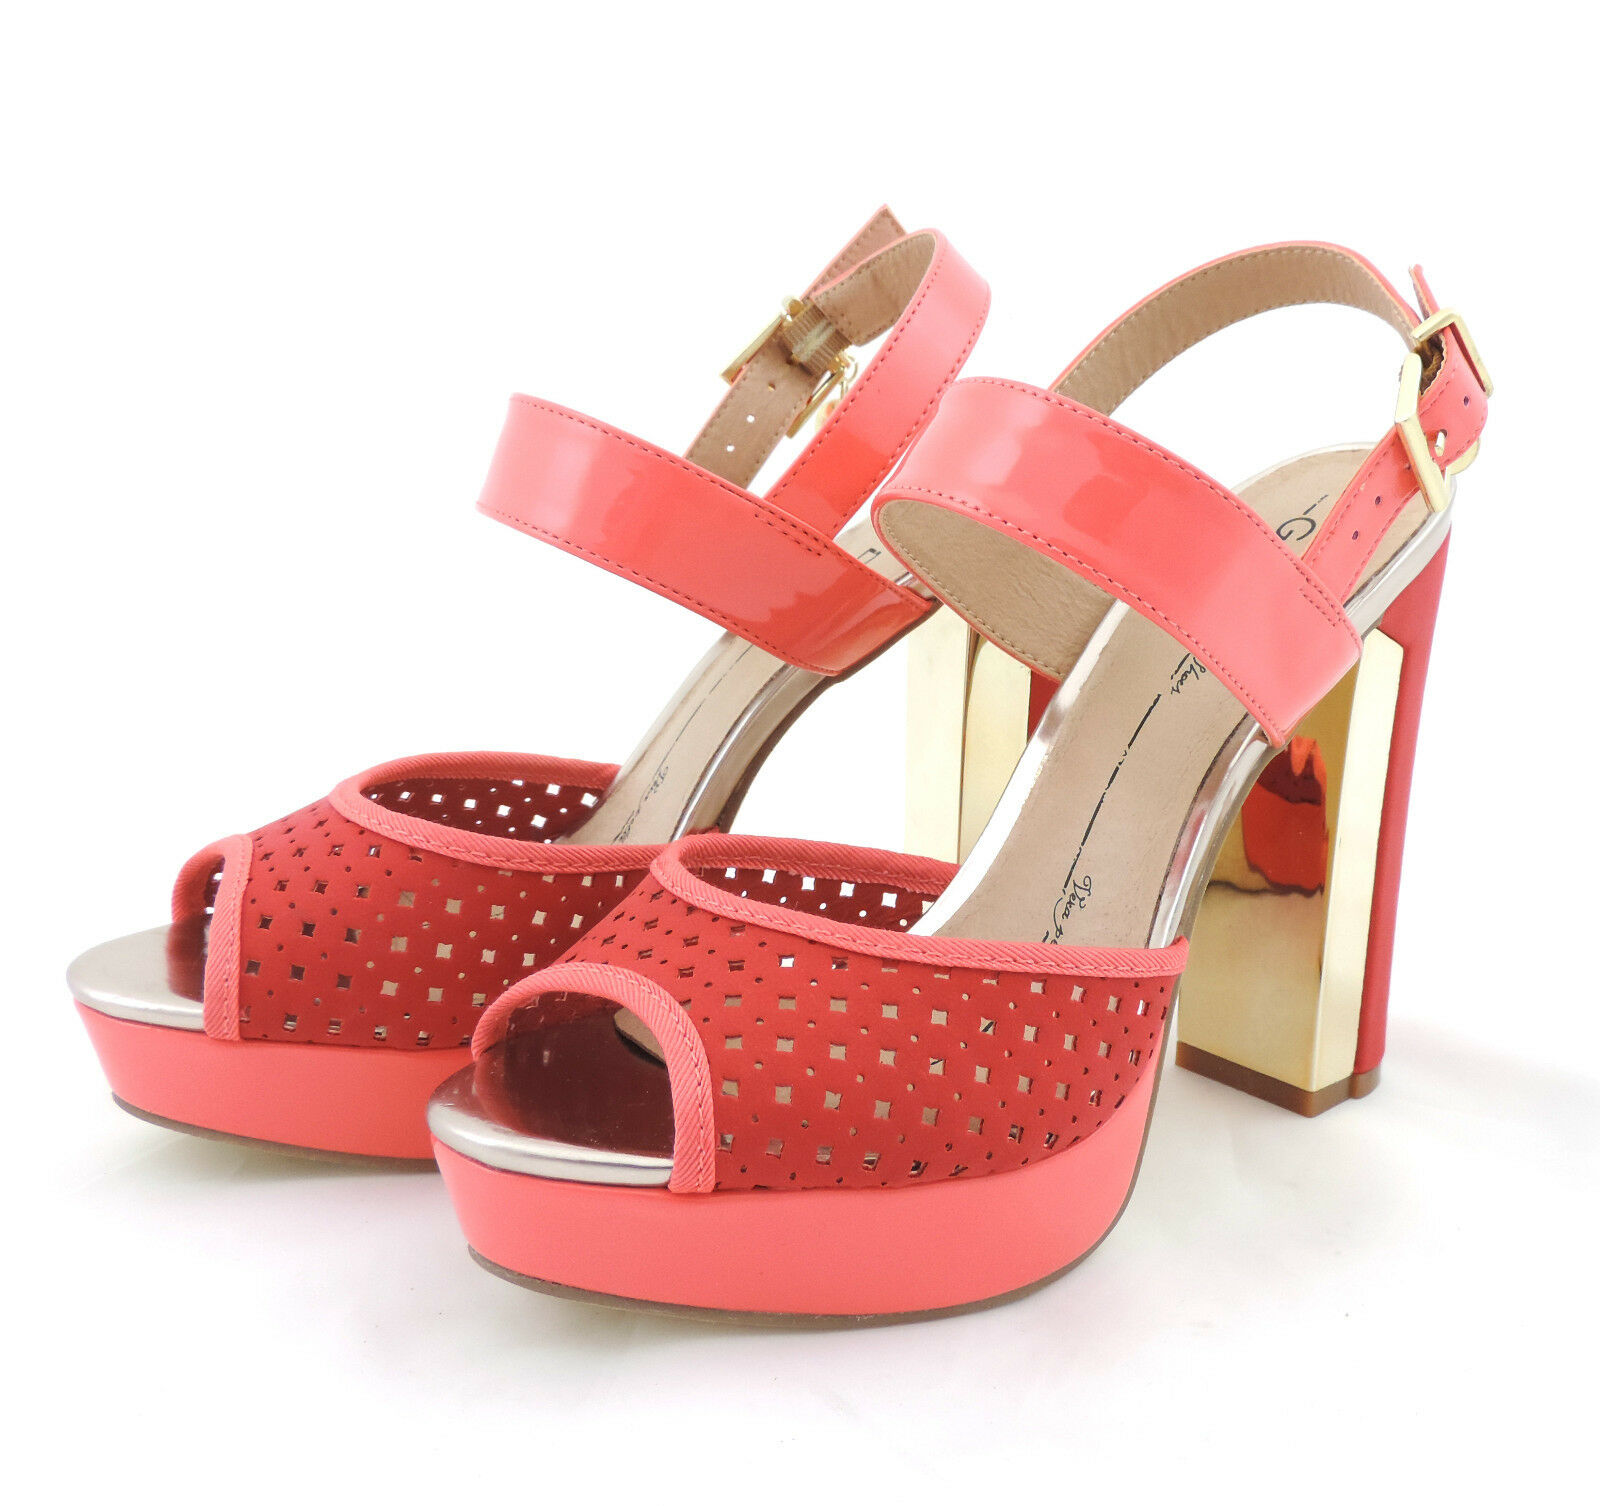 Último gran descuento Gaudi  Sandale high heels rosa lachs  Schuhe pumps neu